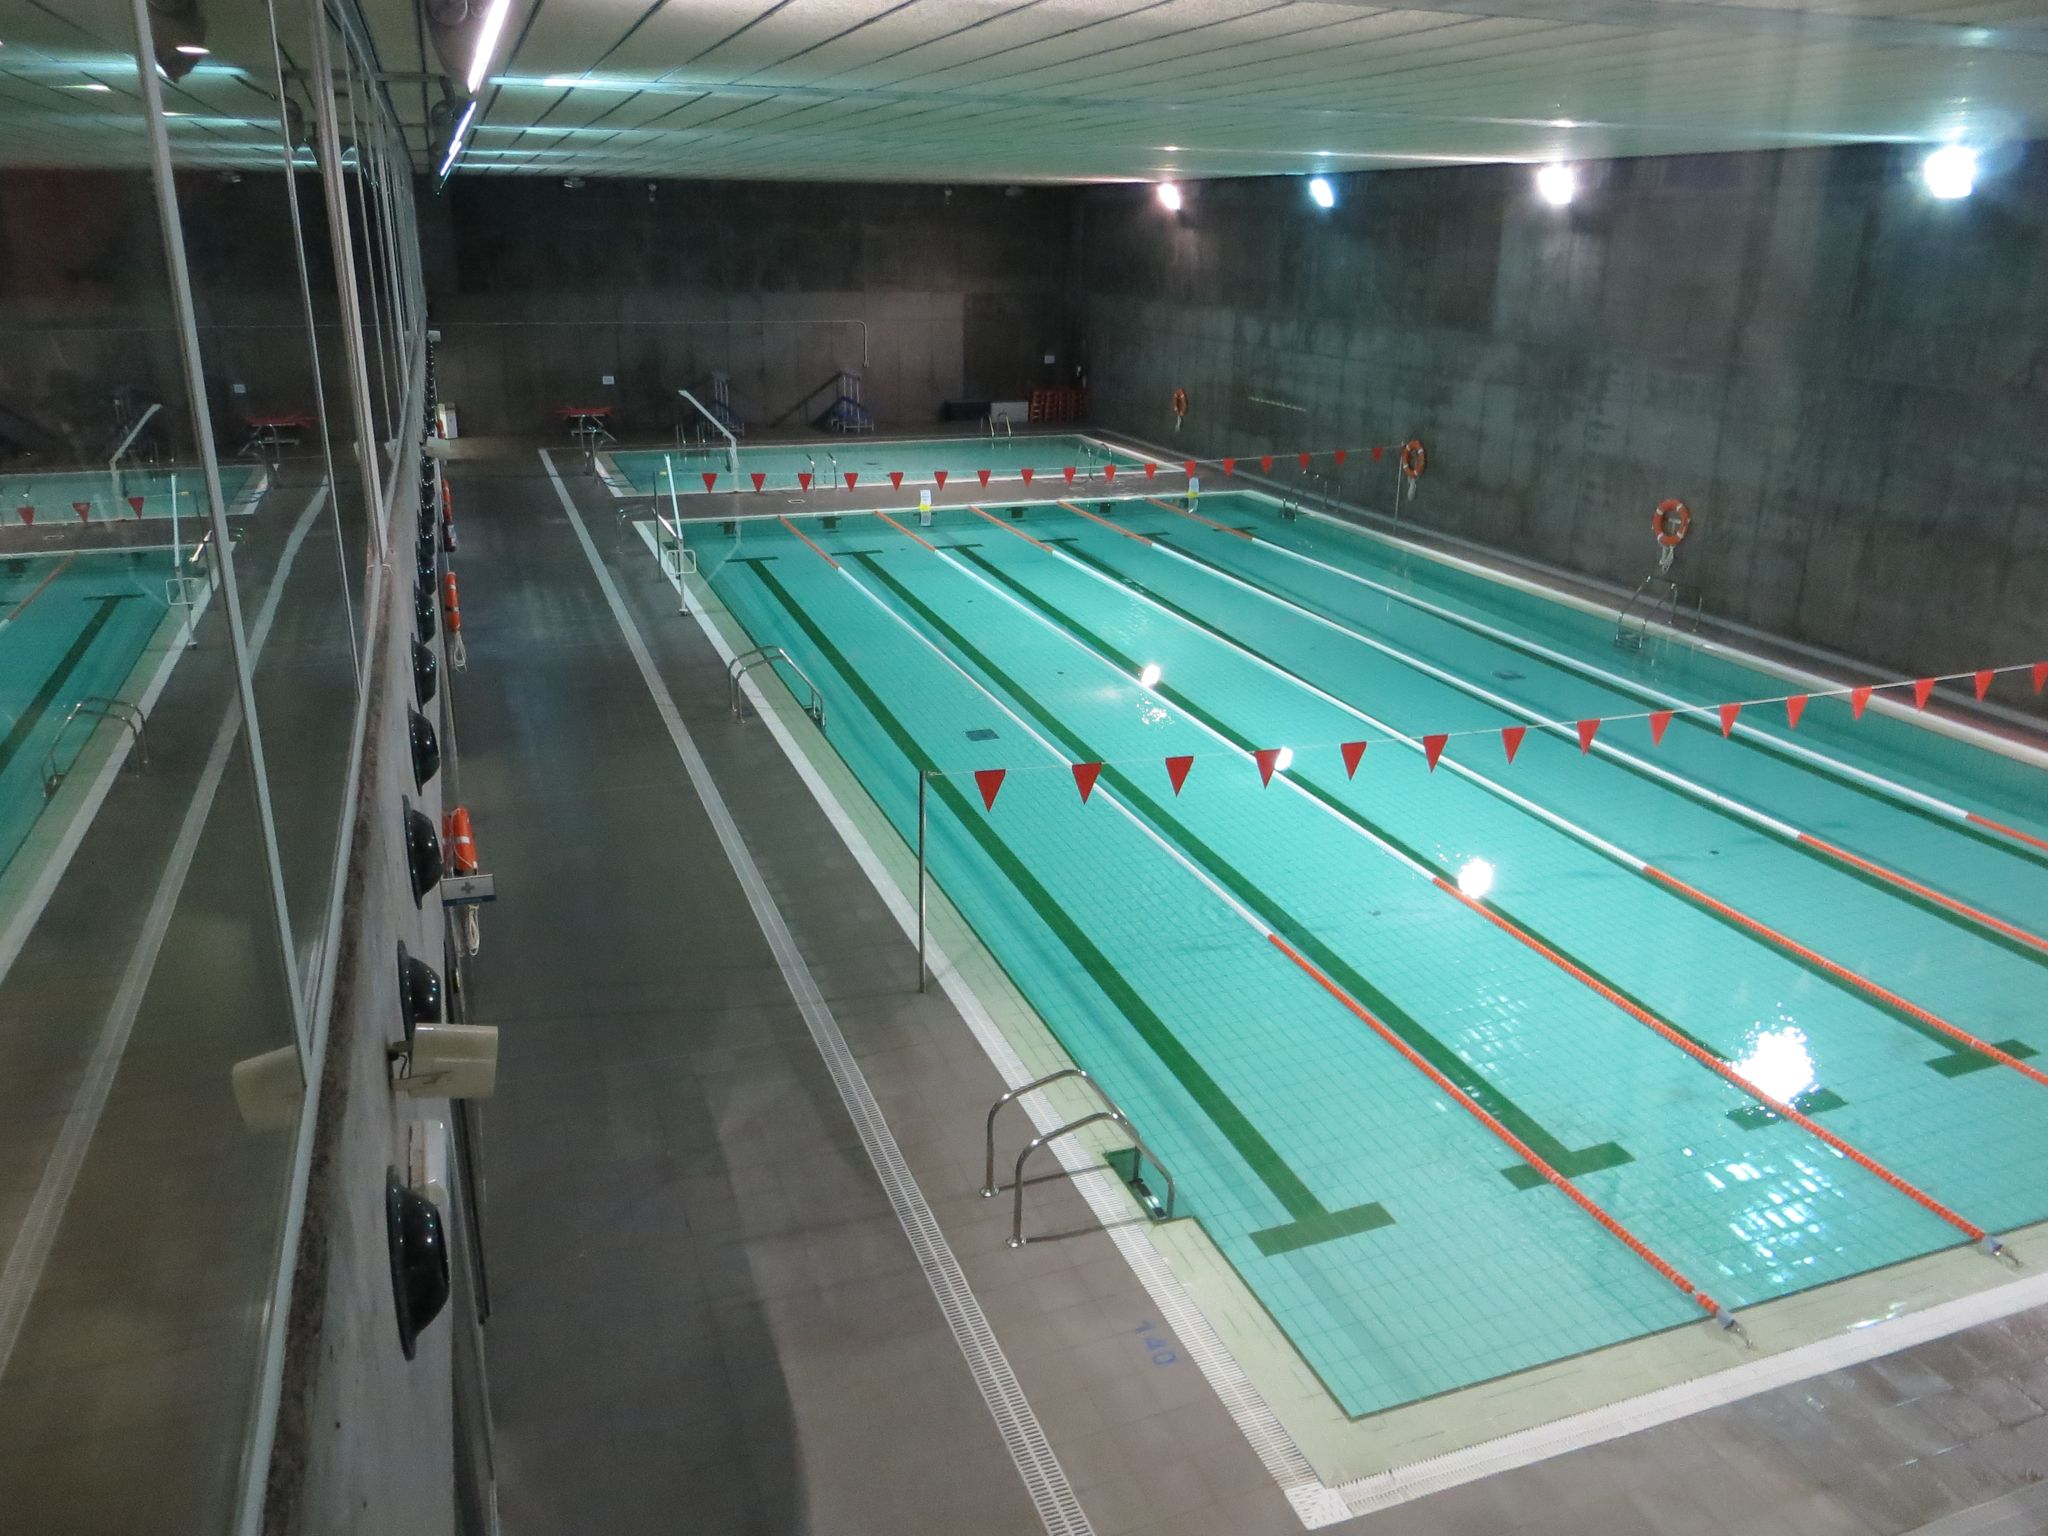 Piscina duquesa villahermosa centro deportivo municipal for Piscina siglo xxi